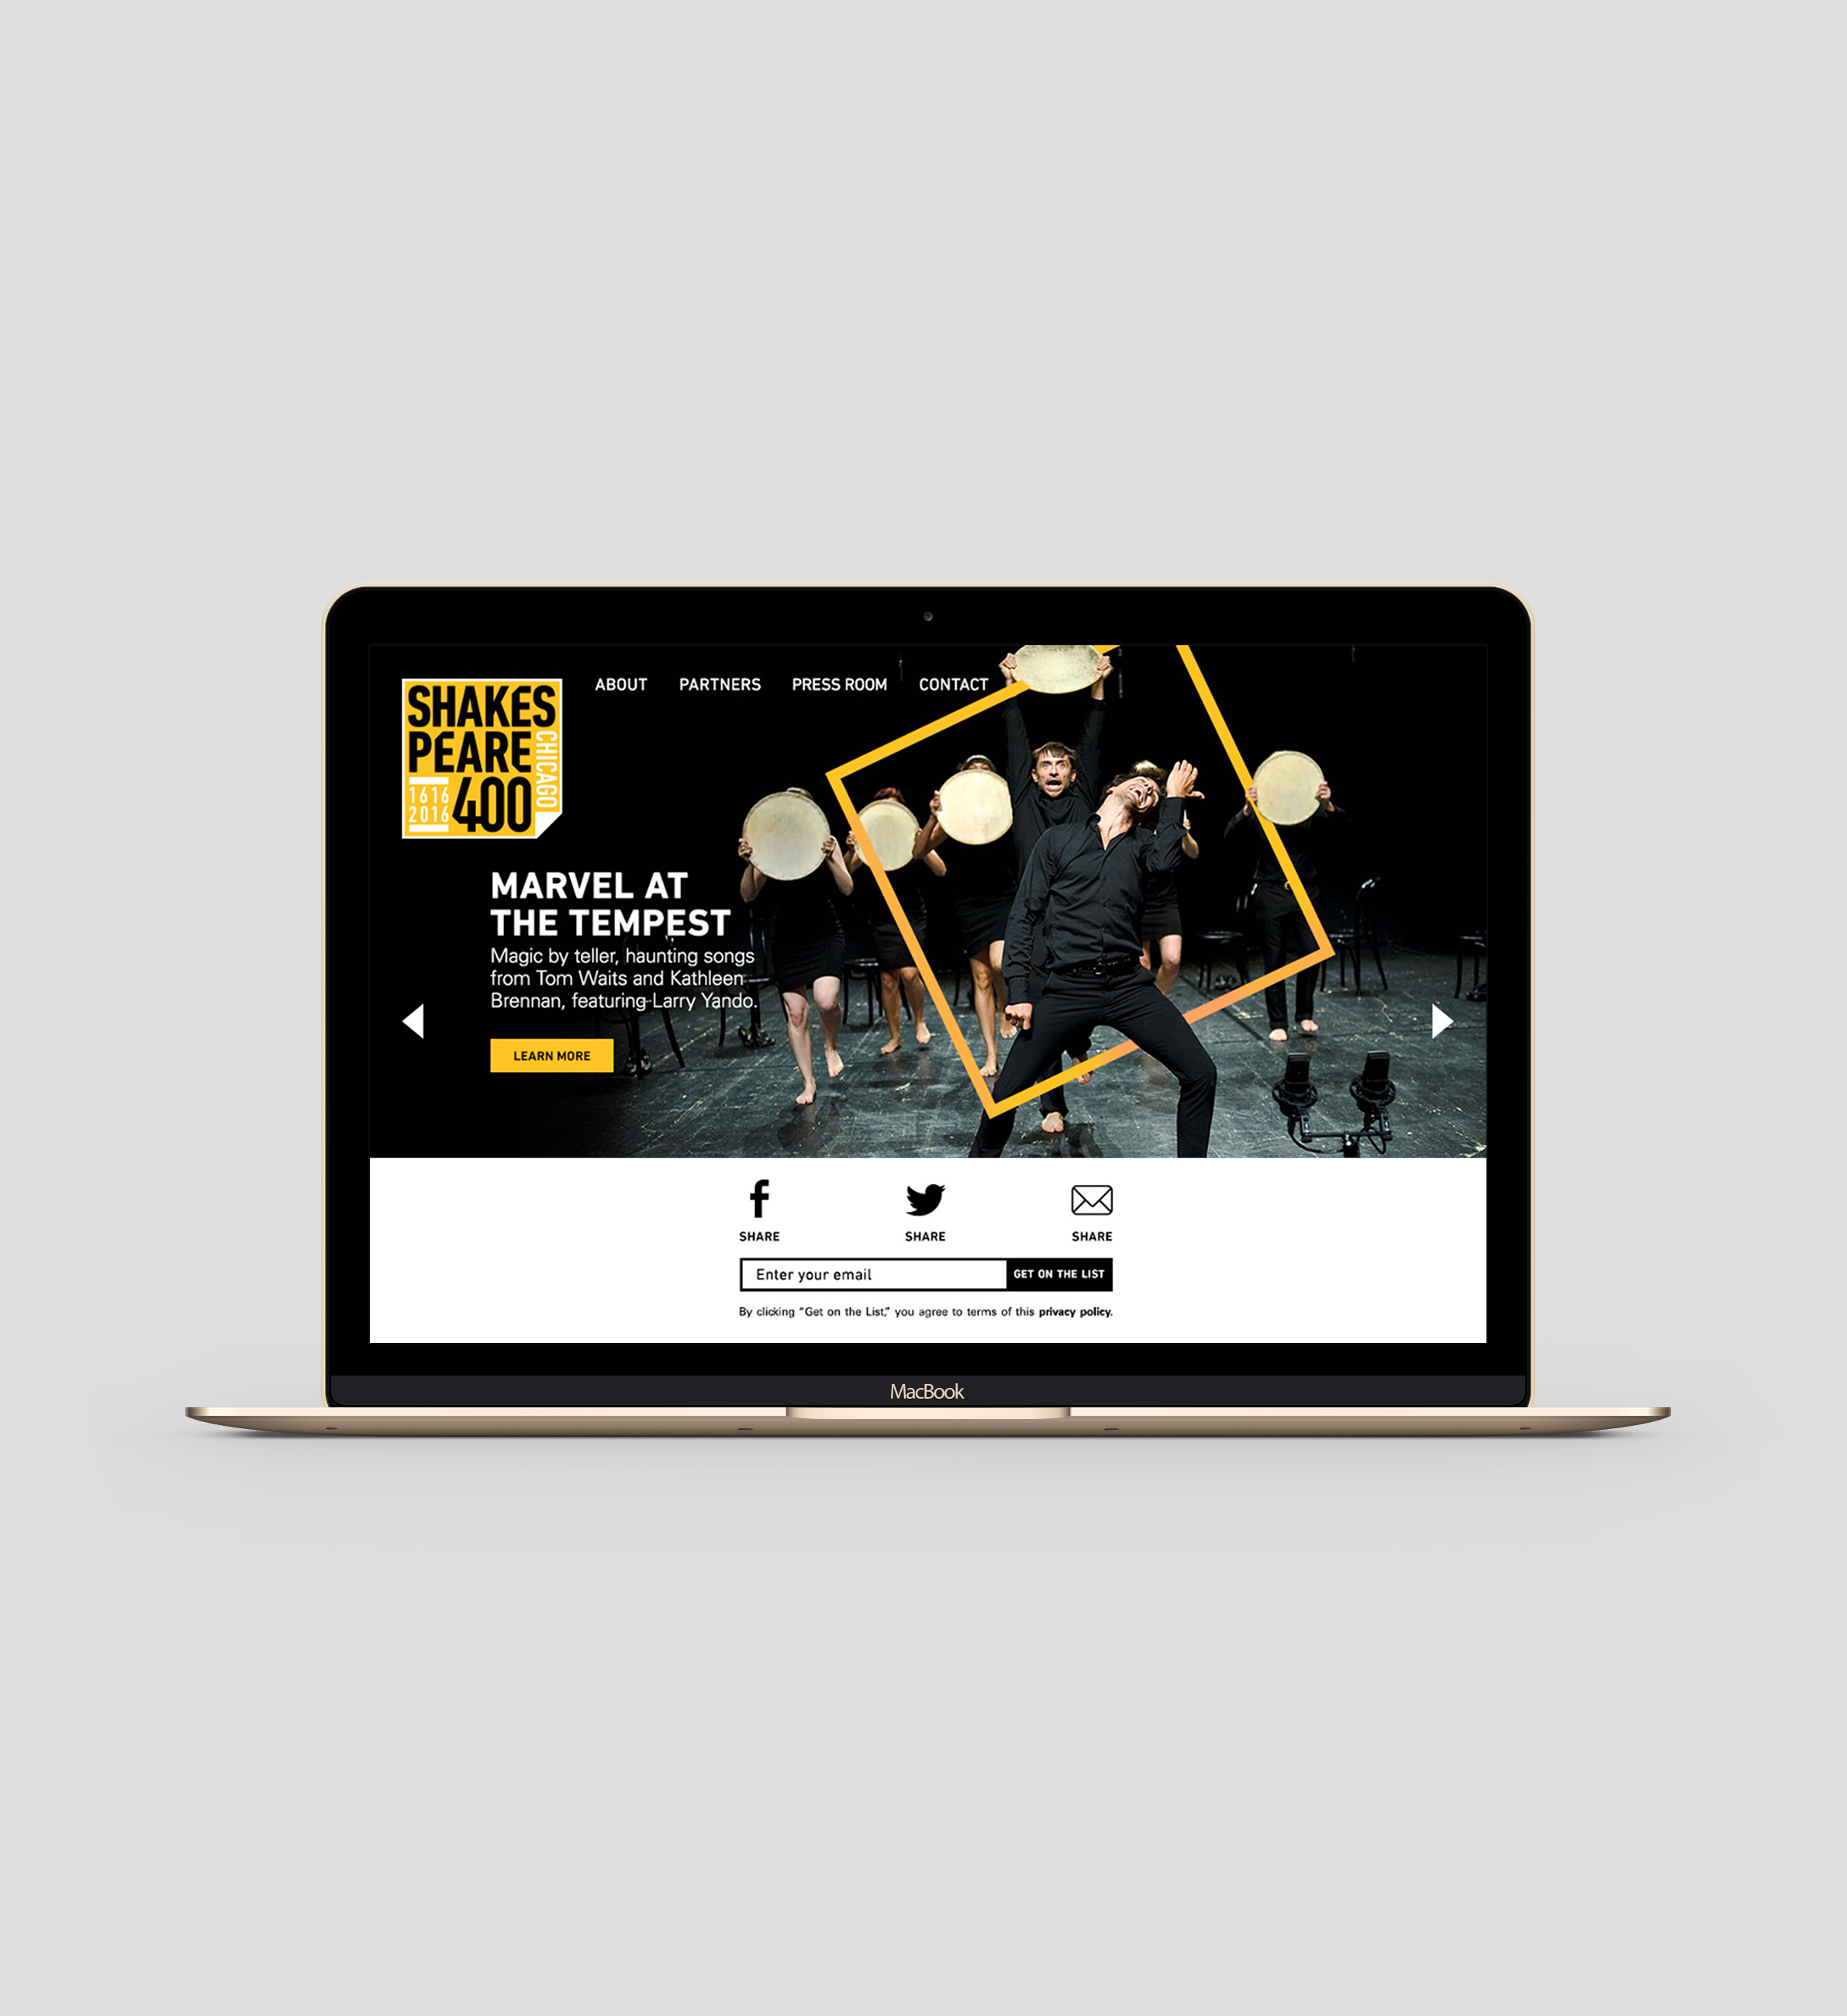 002-MacBook-Gold2.jpg